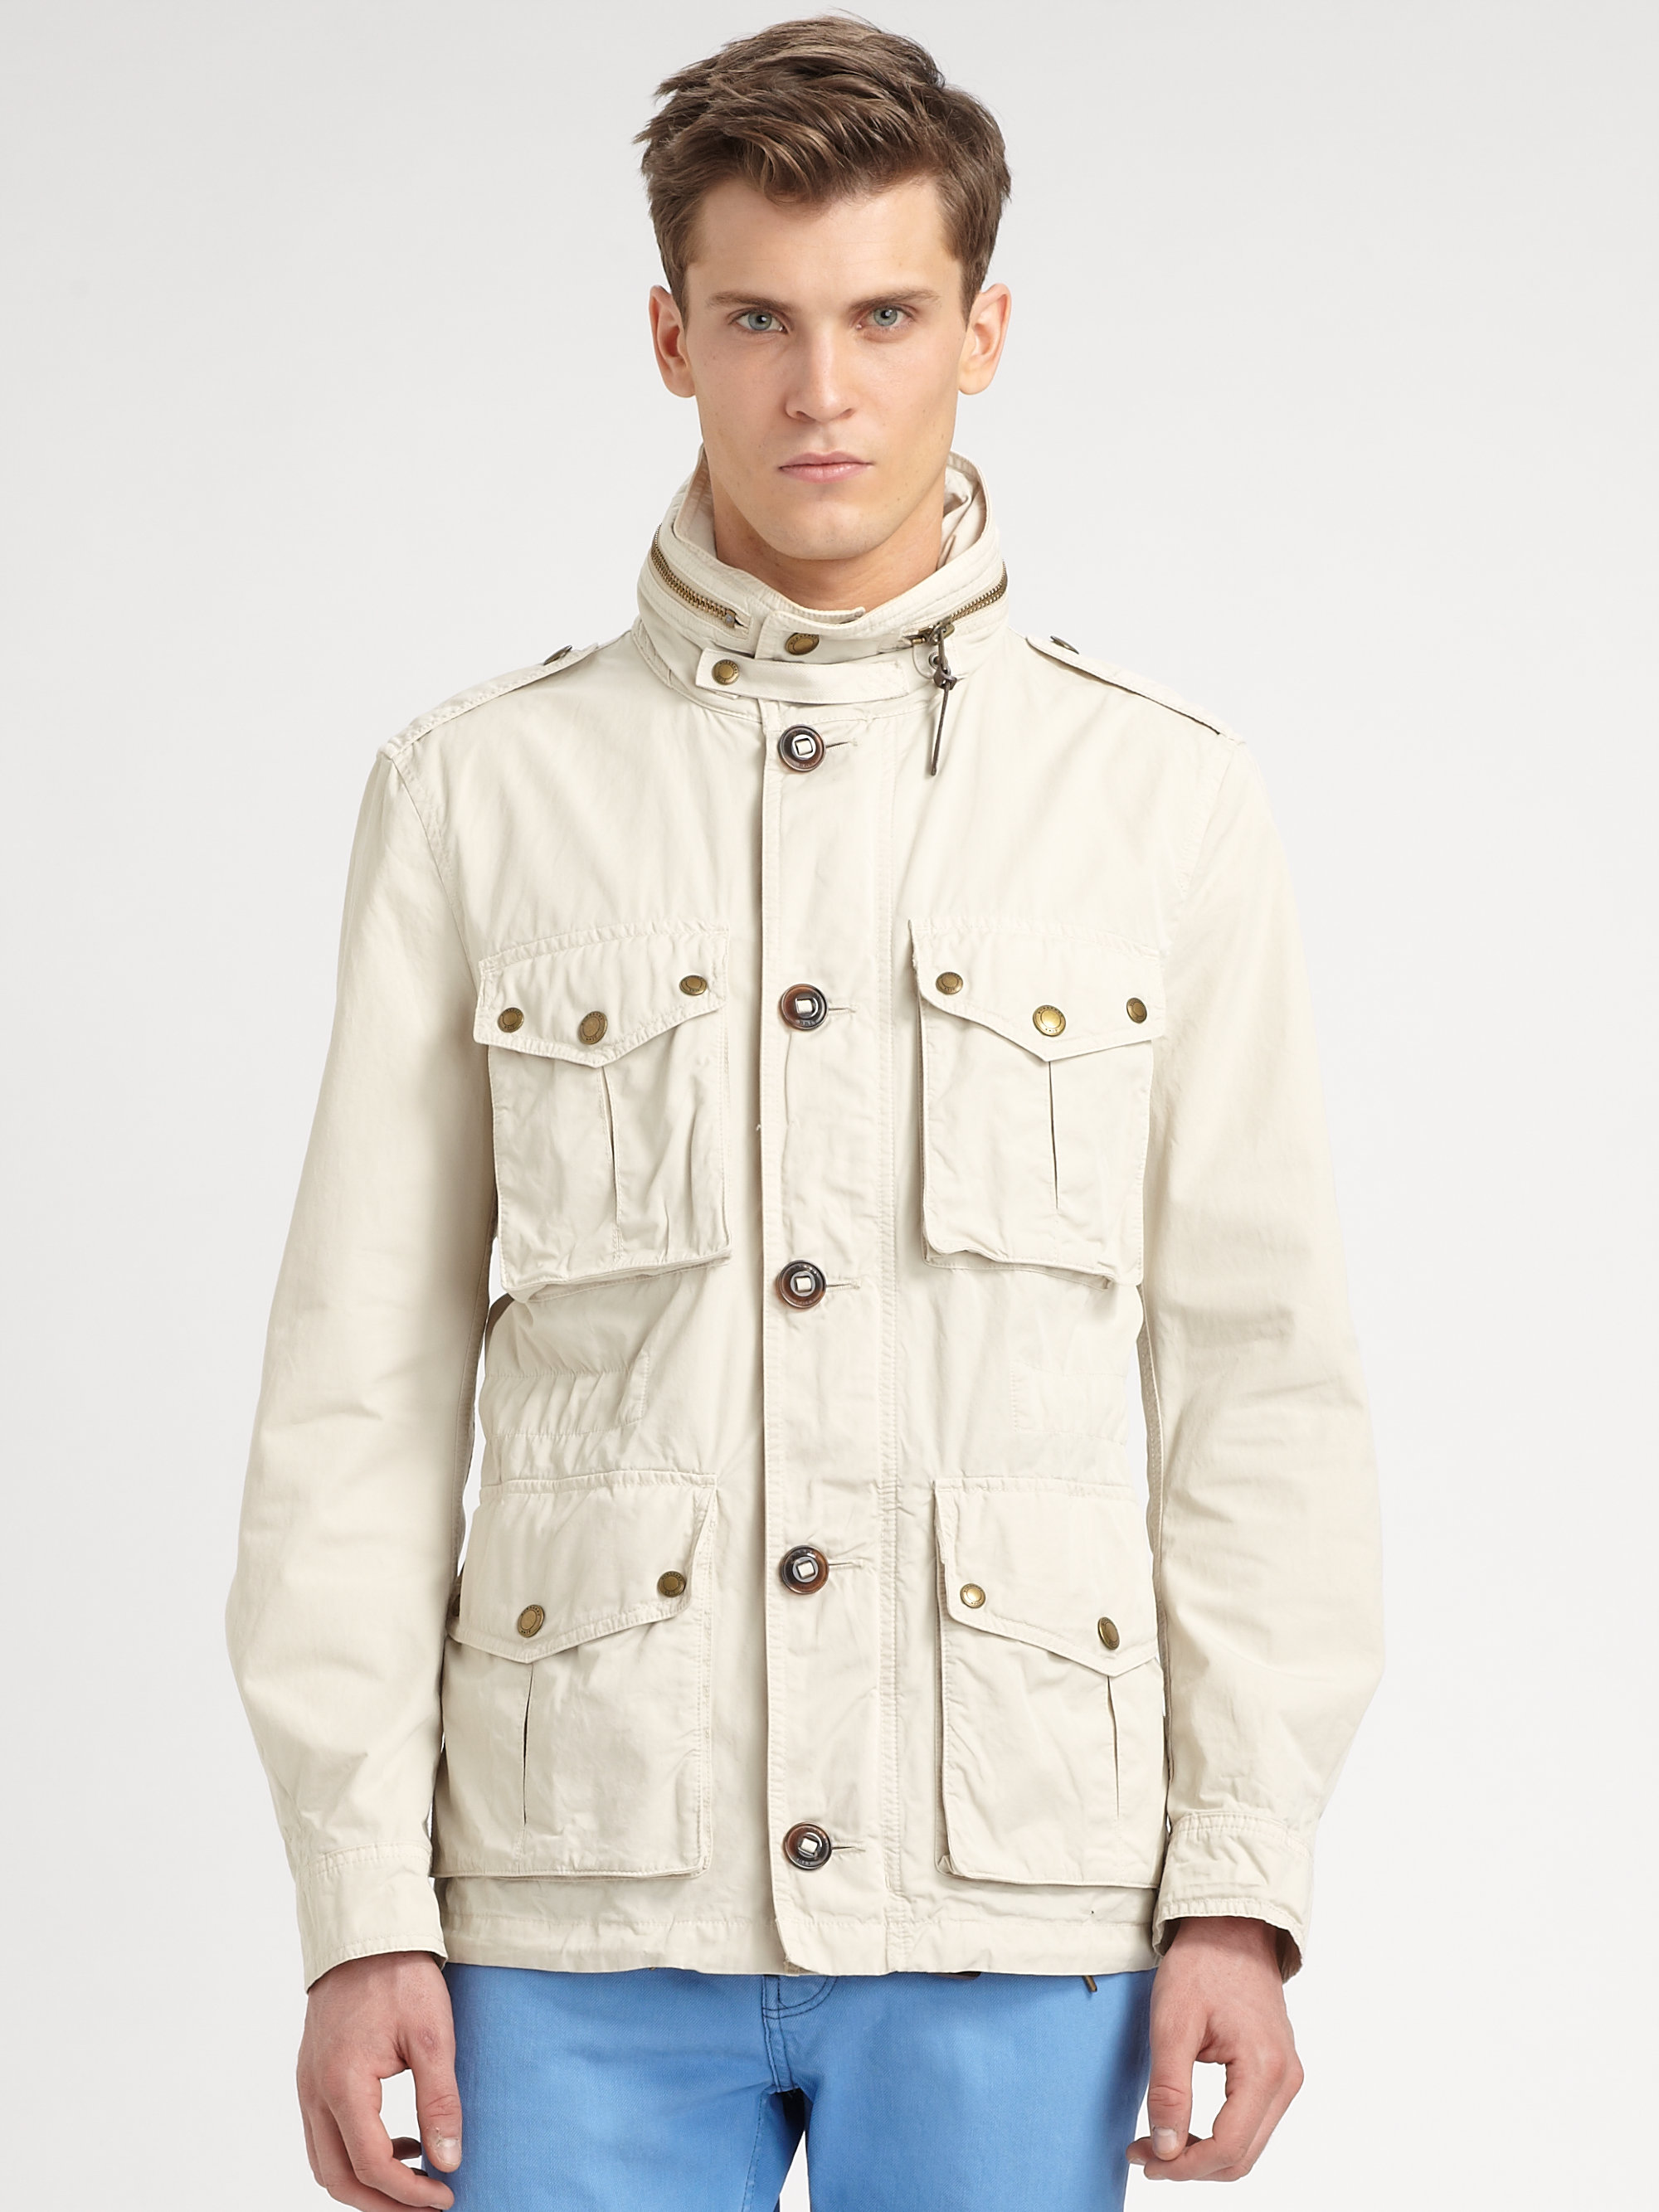 Lyst Burberry Brit Cotton Safari Jacket In Natural For Men